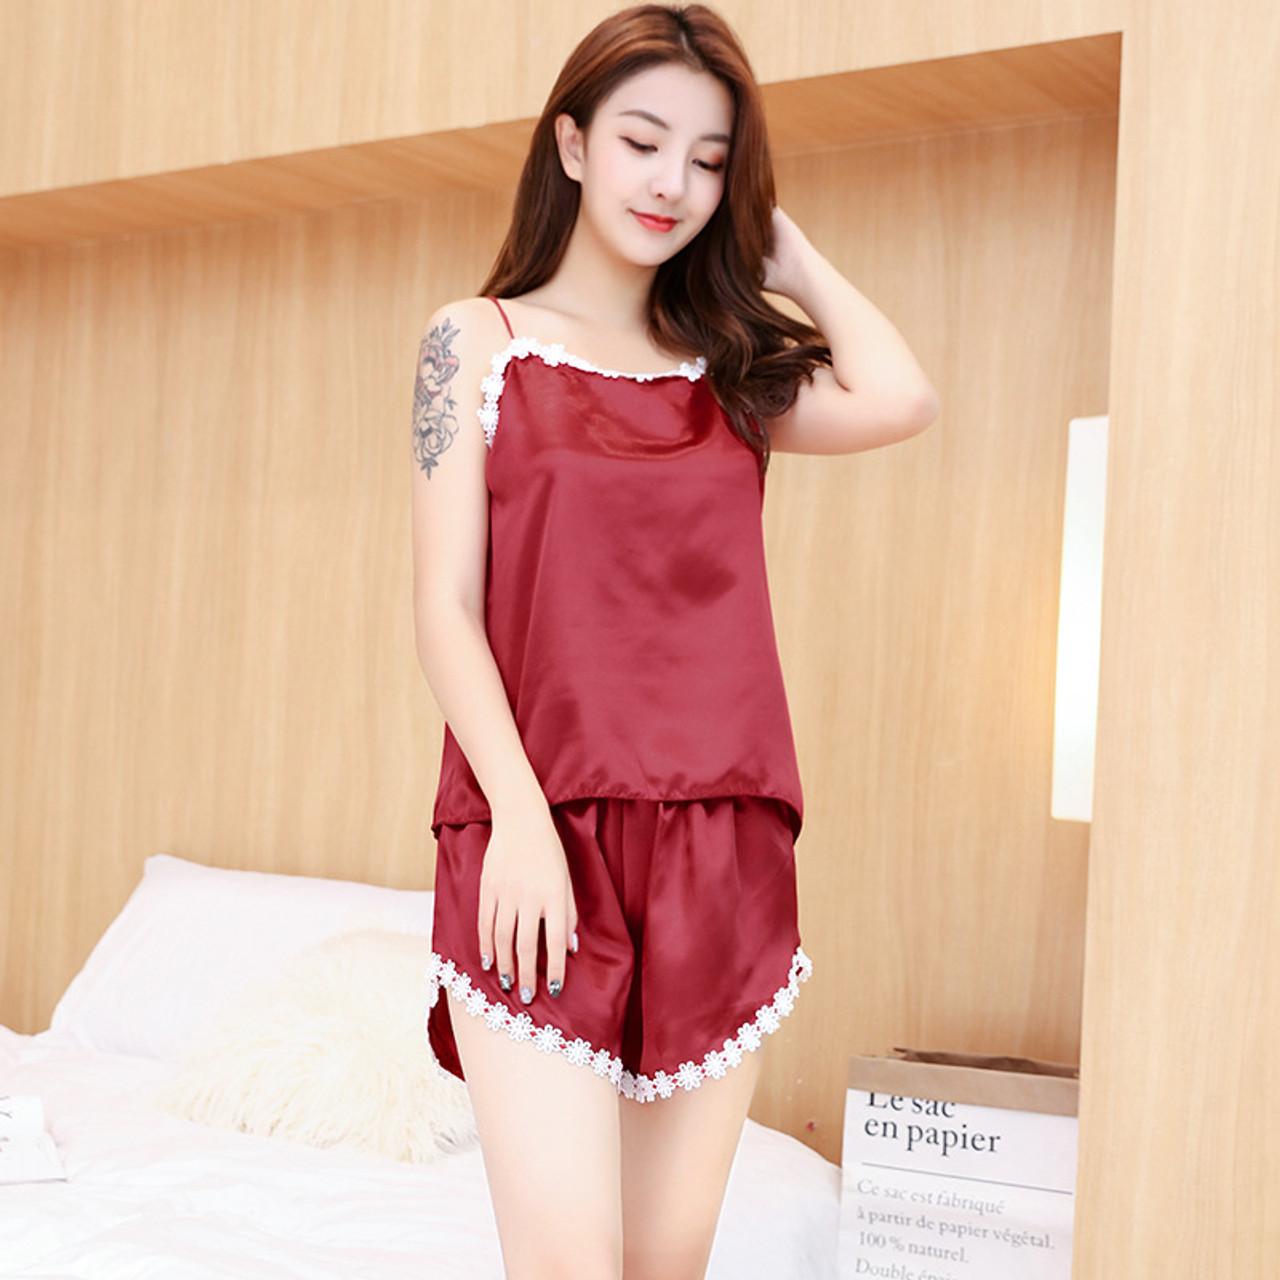 dceba64432 Ladies Sexy Summer Night Dress Women Satin Lace Sleepwear Silk Nightgown  Sleeveless V-Neck Nightdress Plus Size Female Nightie